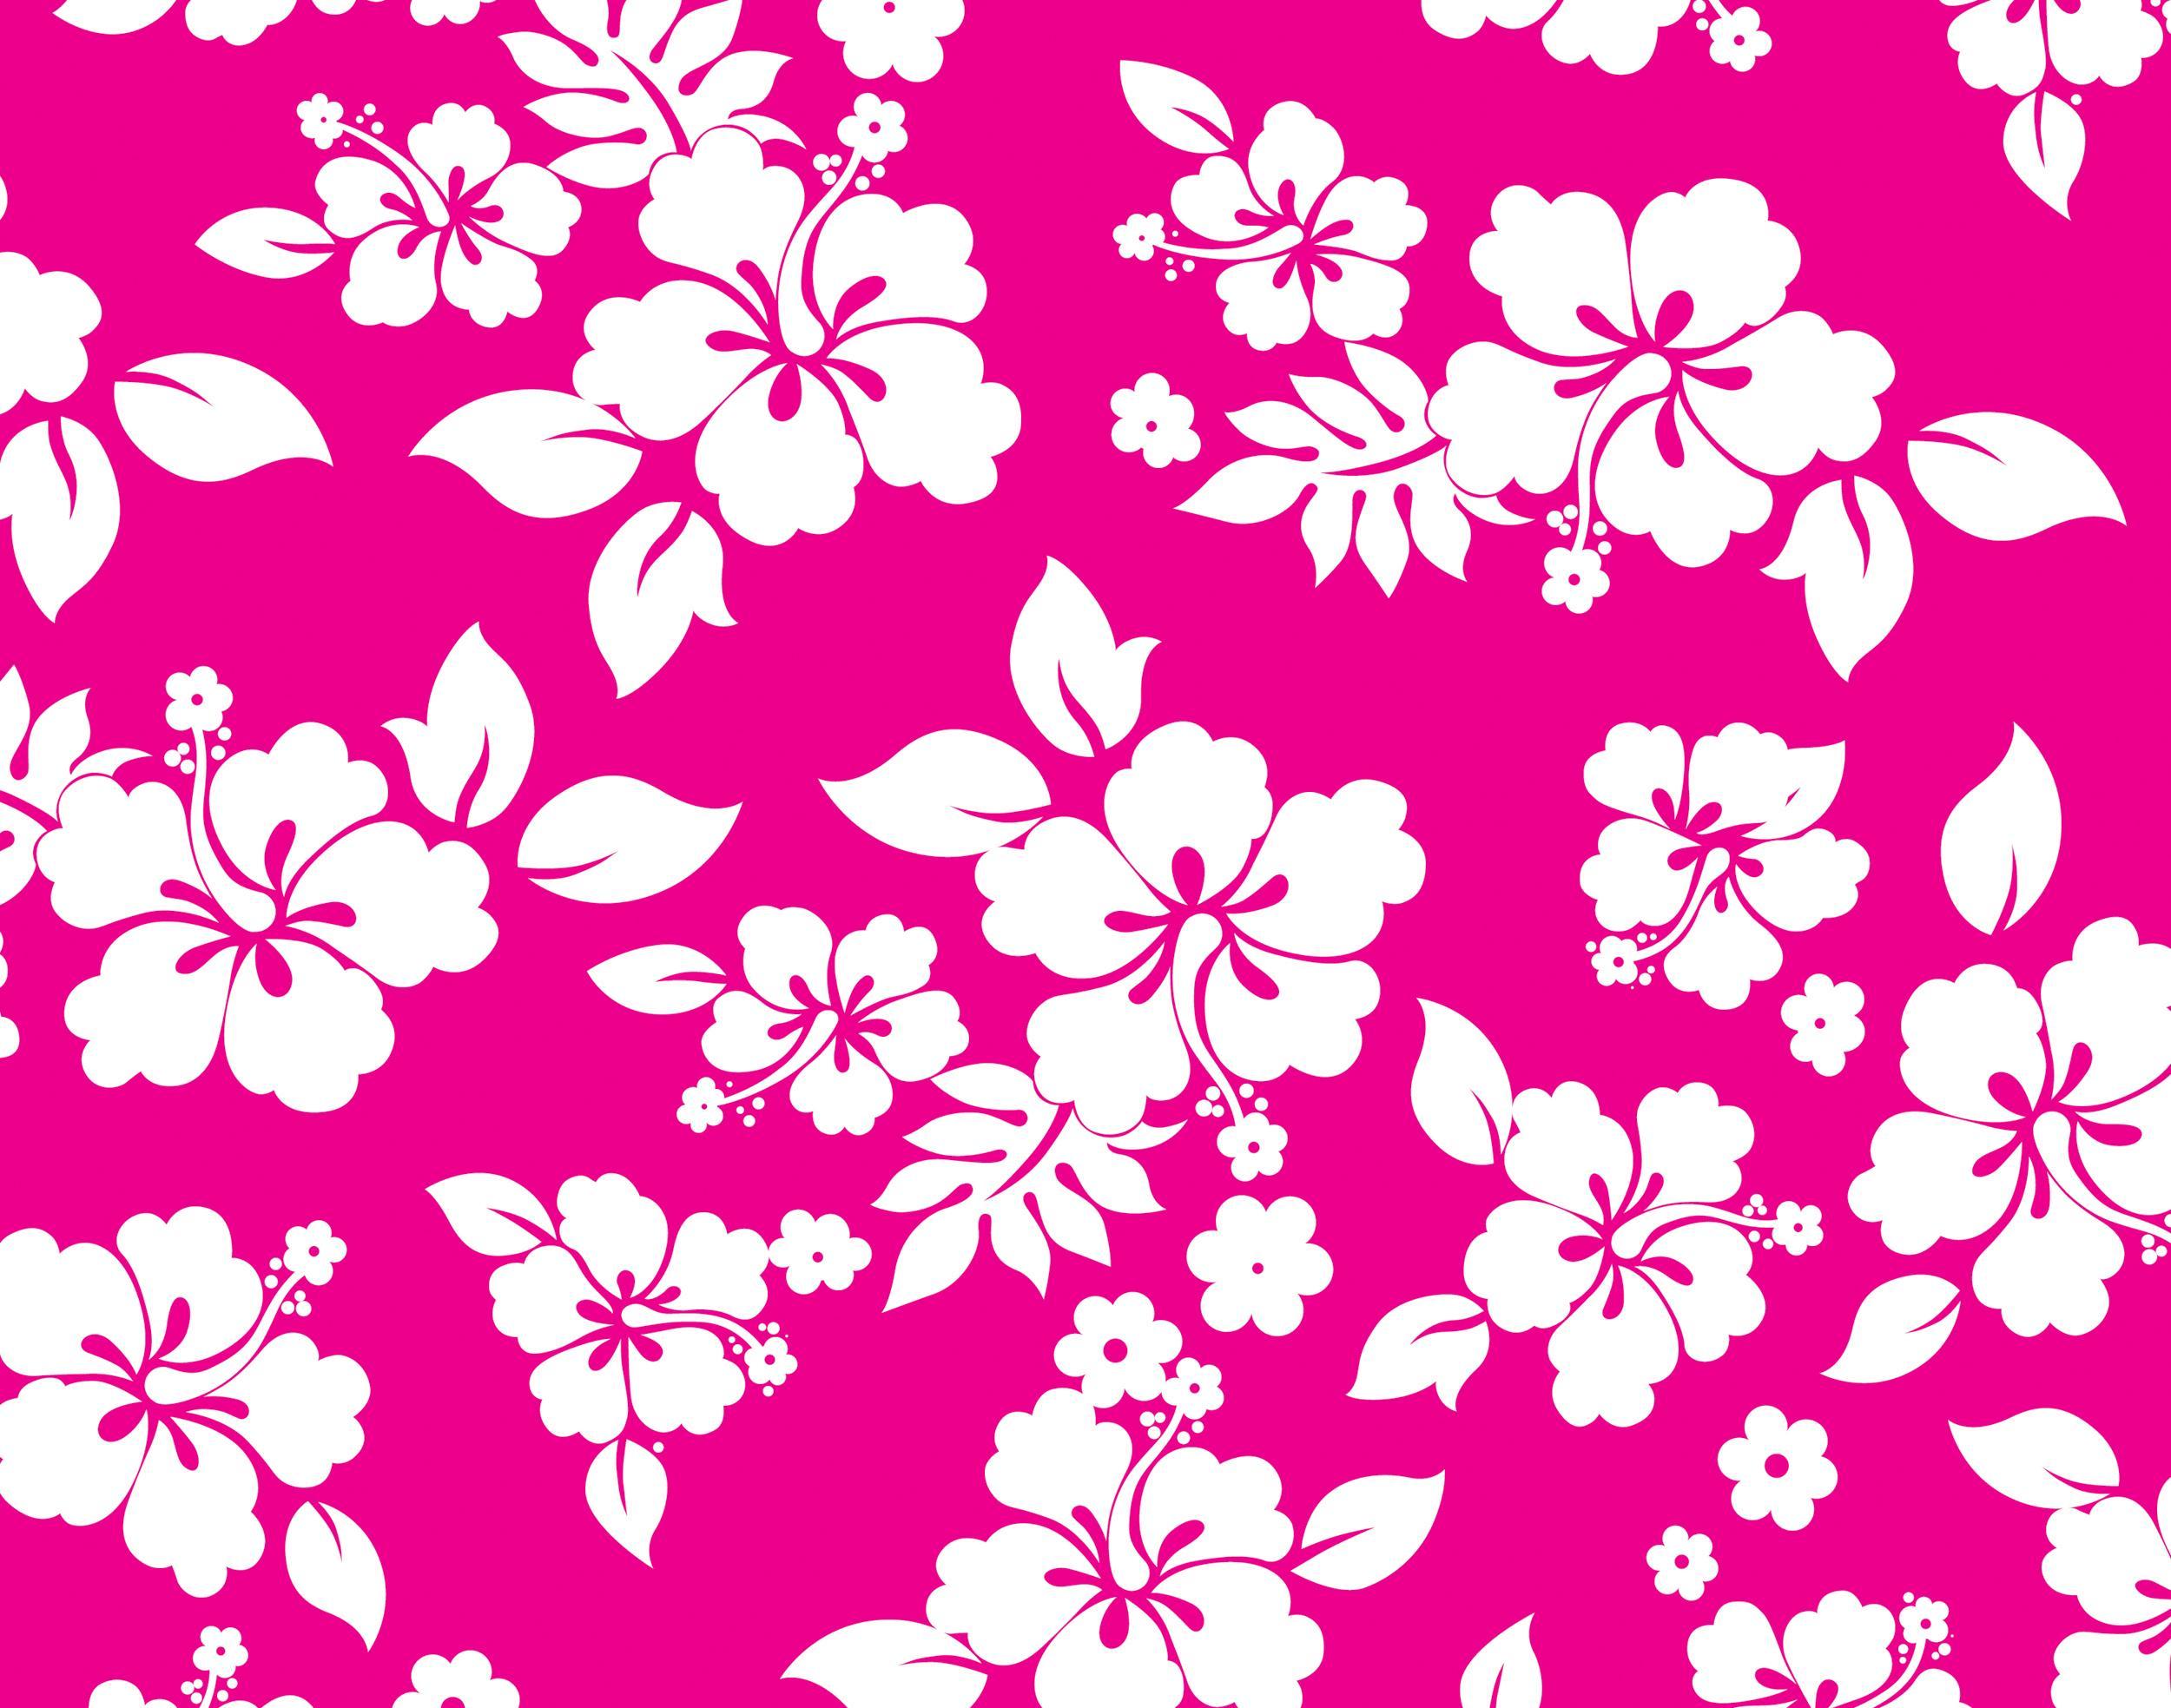 Pink Hawaiian Flower Graphic 1024x768 Resolution Backgrounds